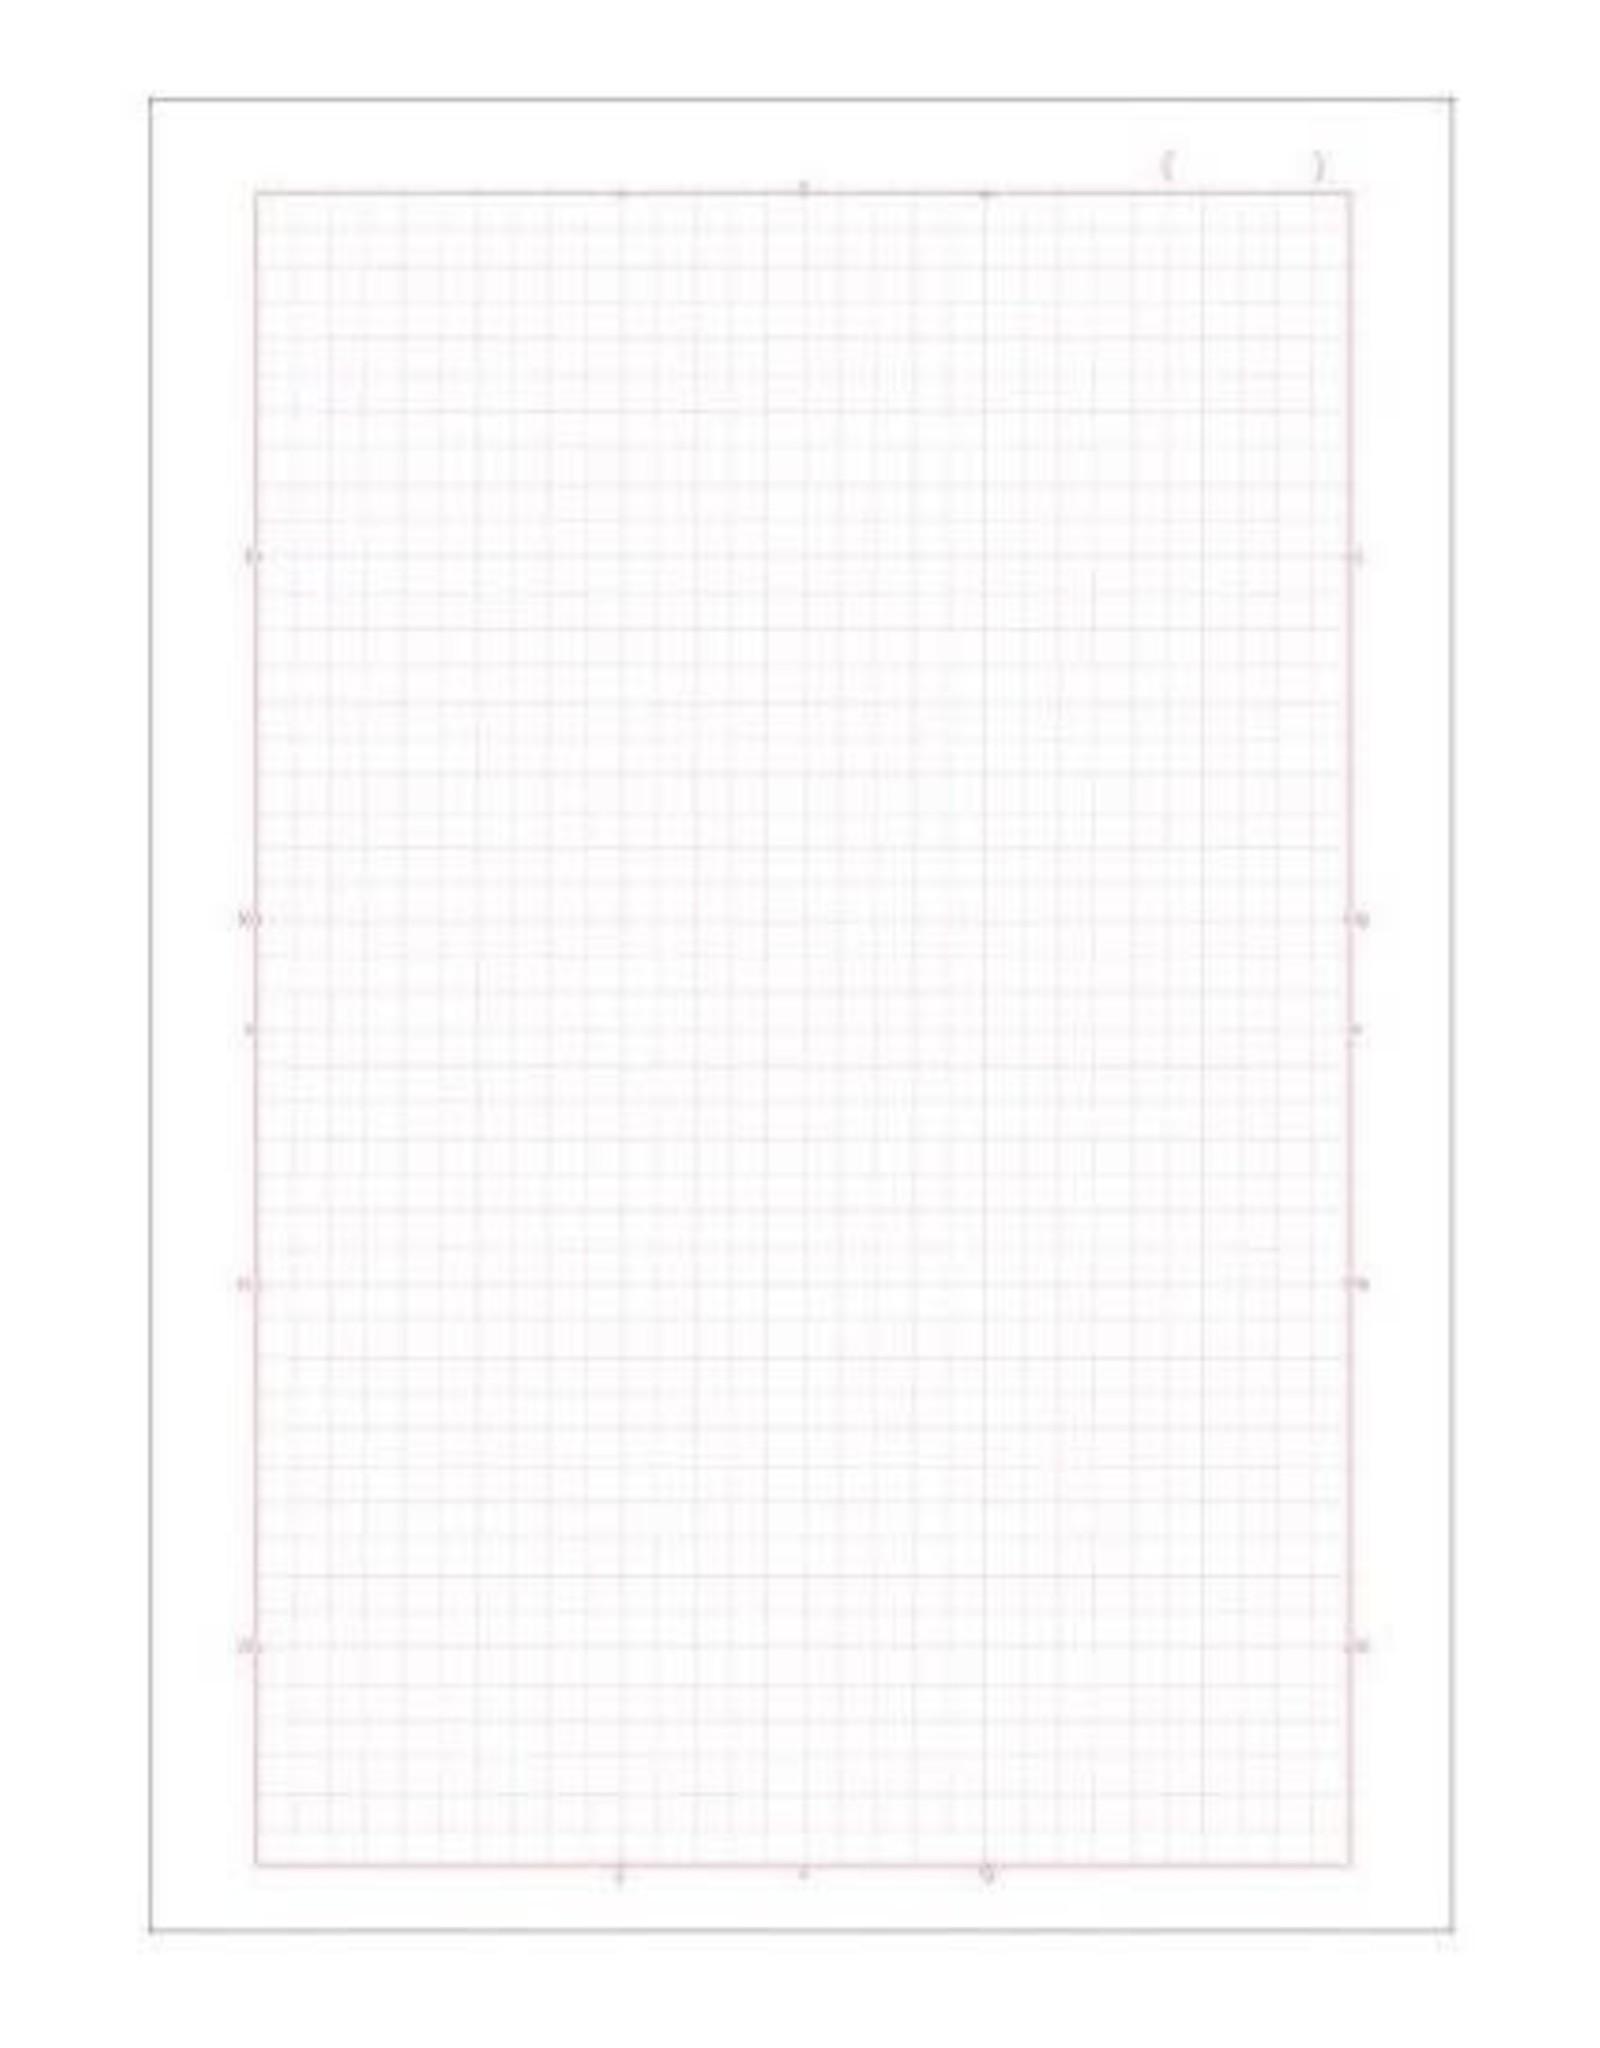 Kyokuto Associates co., ltd. KYOKUTO  GRID NOTEBOOK - FLAMINGO LT01P